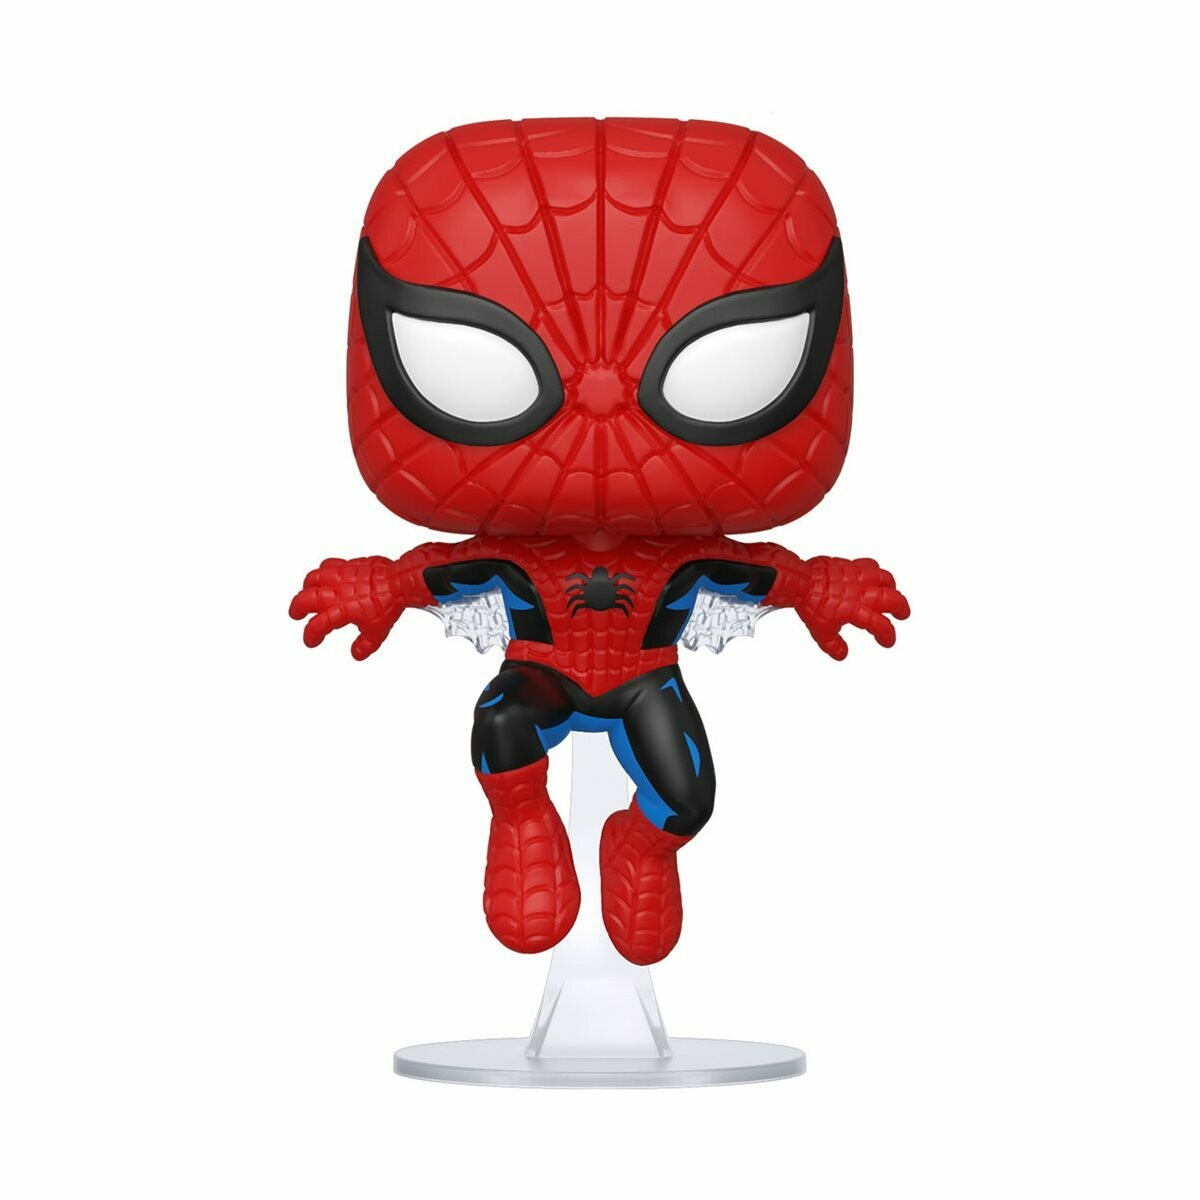 Funko Marvel 80th First Appearance Spider-Man Pop! Vinyl Figure